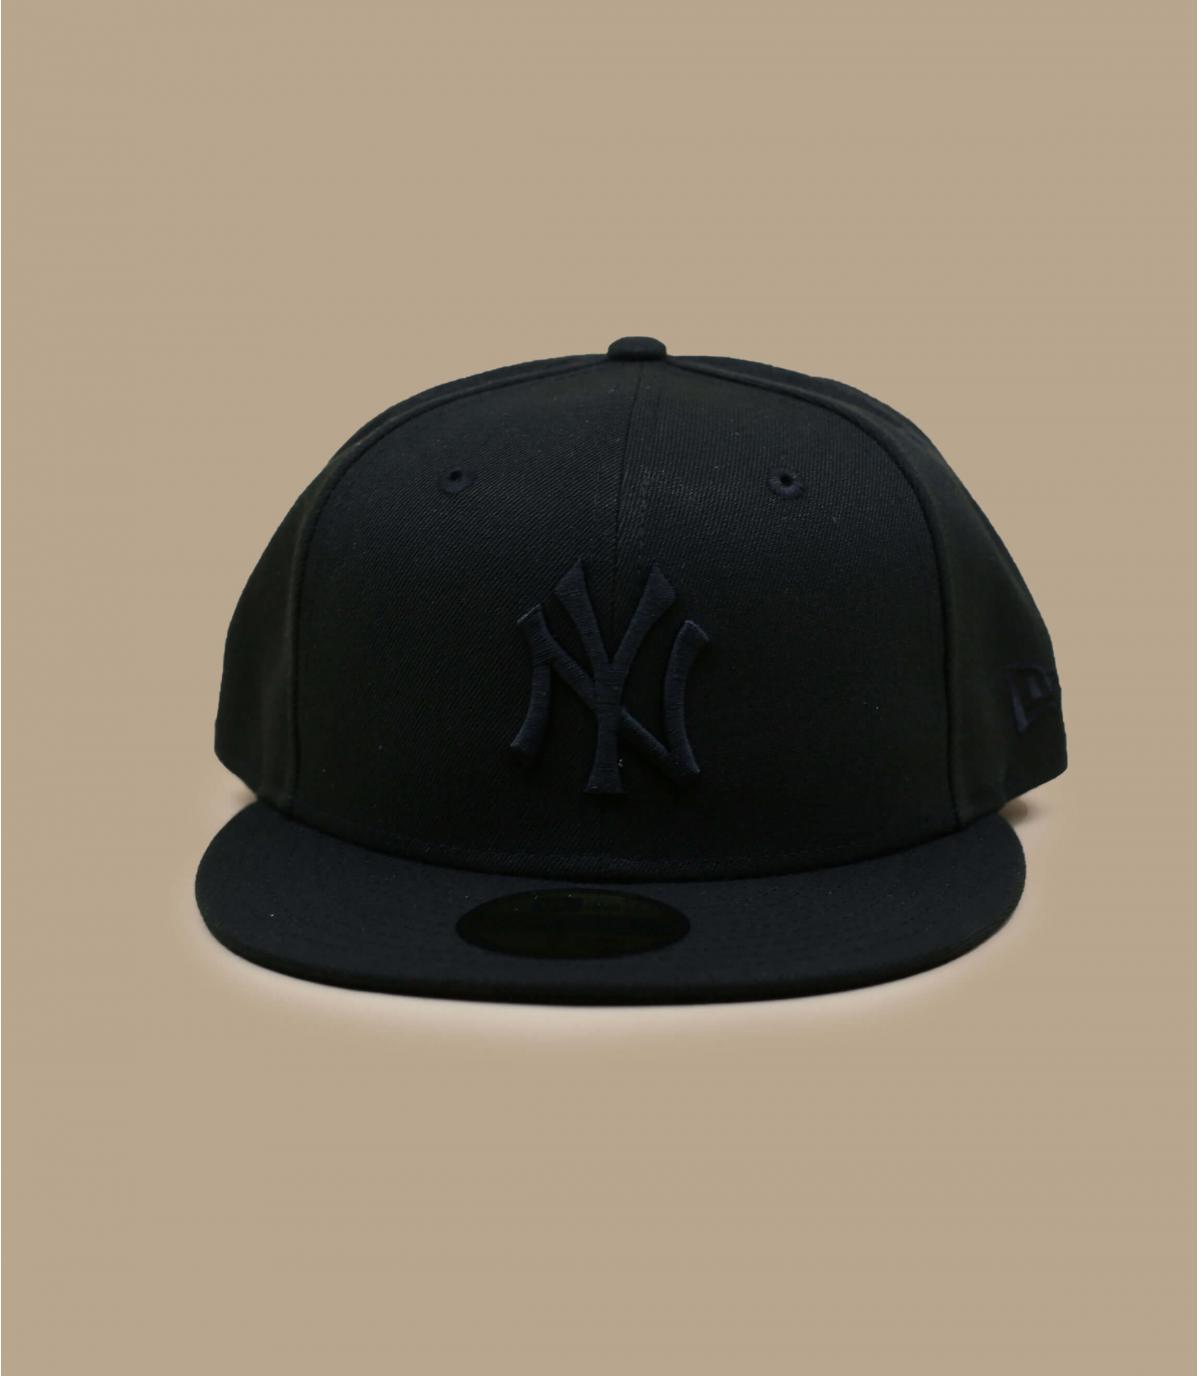 casquette ny noire logo noir par new era black on black. Black Bedroom Furniture Sets. Home Design Ideas